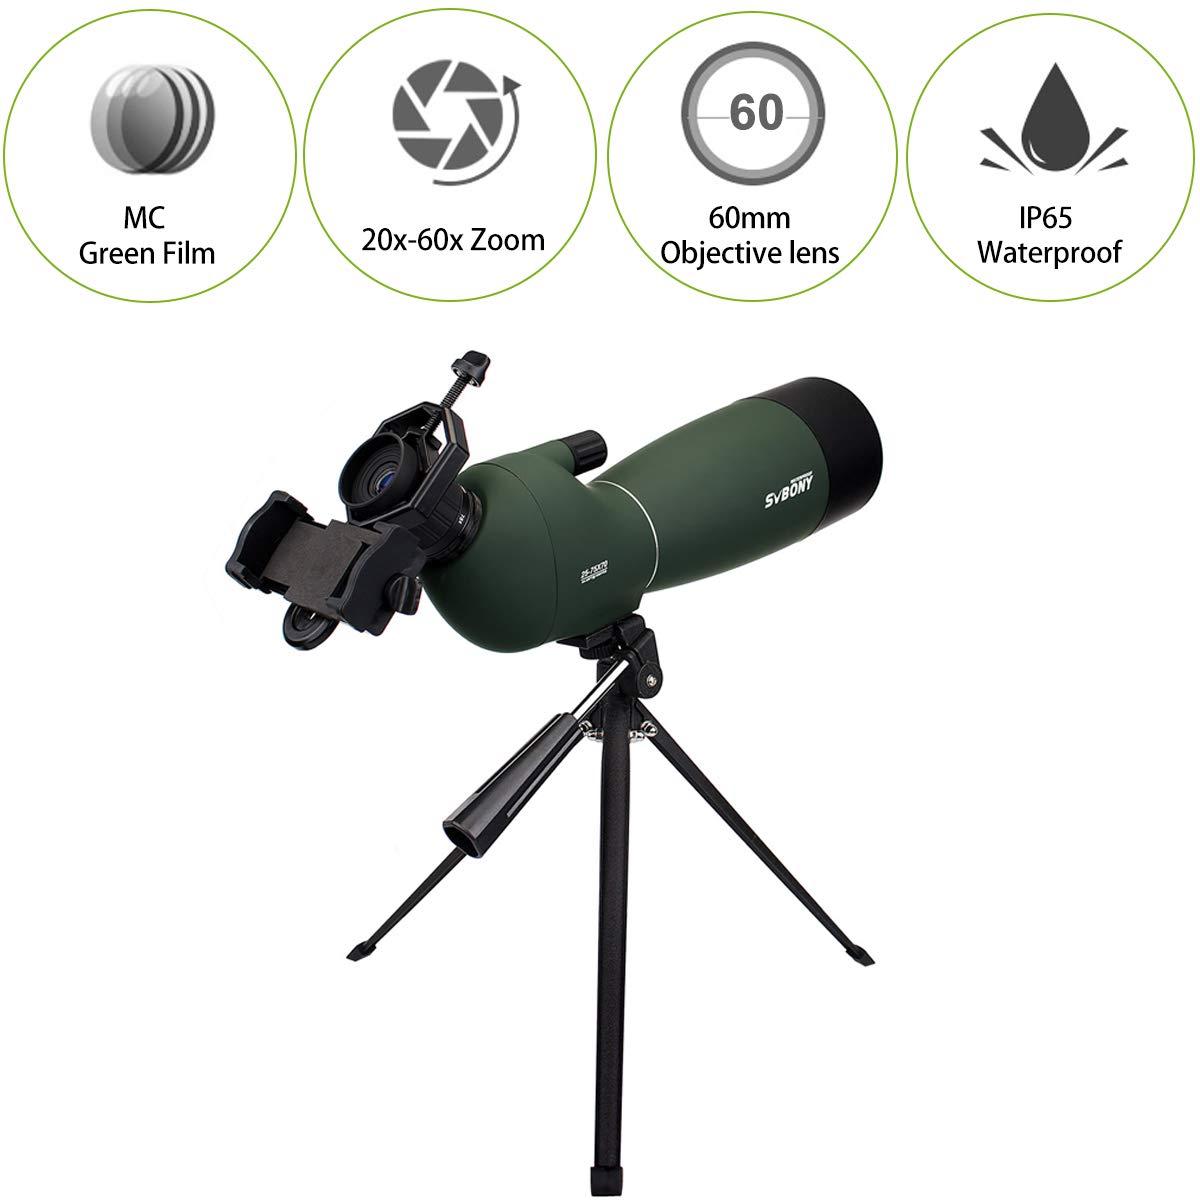 SVBONY SV28 20-60x60mm Angled Zoom Spotting Scope MC IP65 Waterproof+Tripod Hot